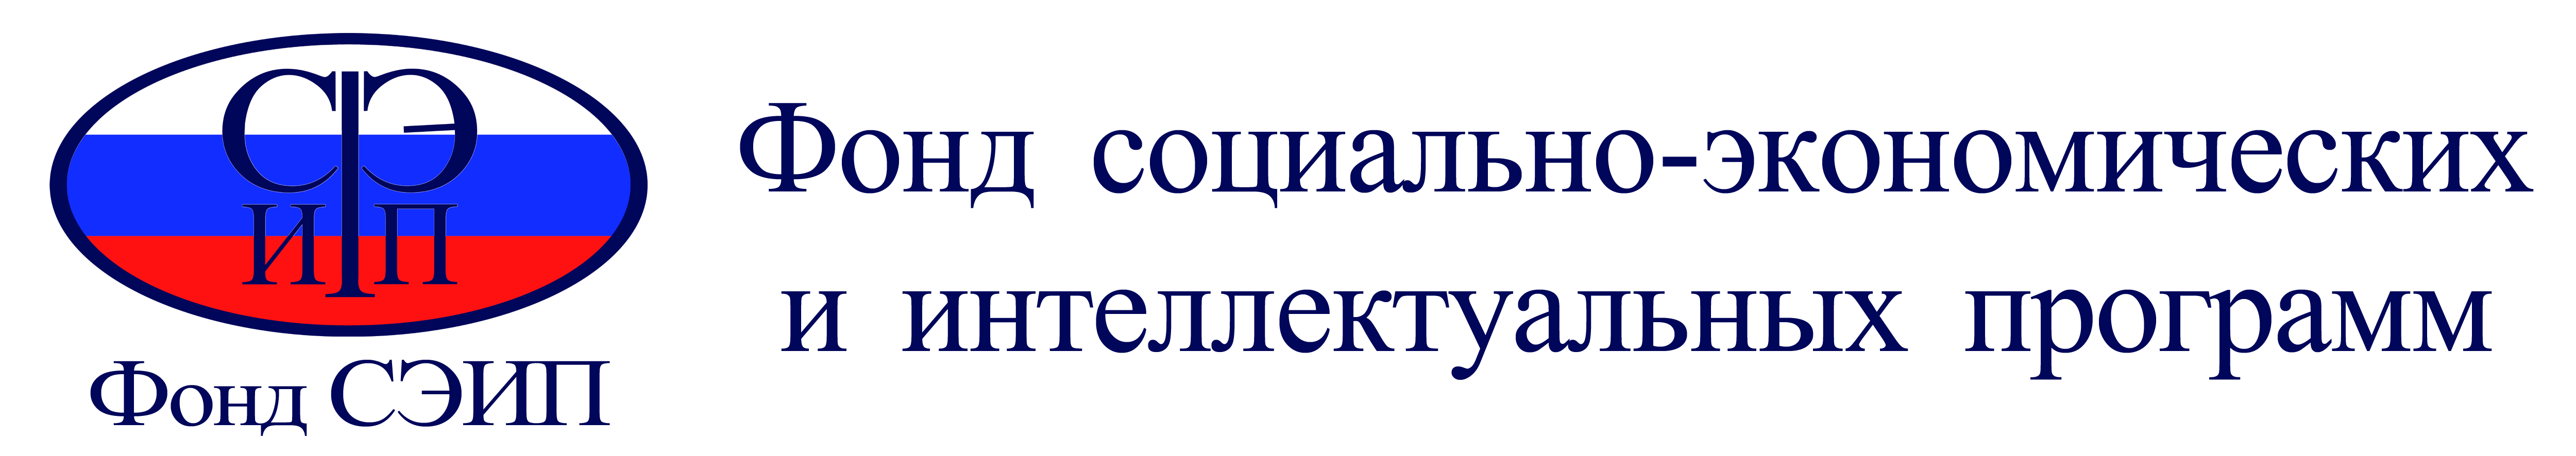 Фонд СЭИП